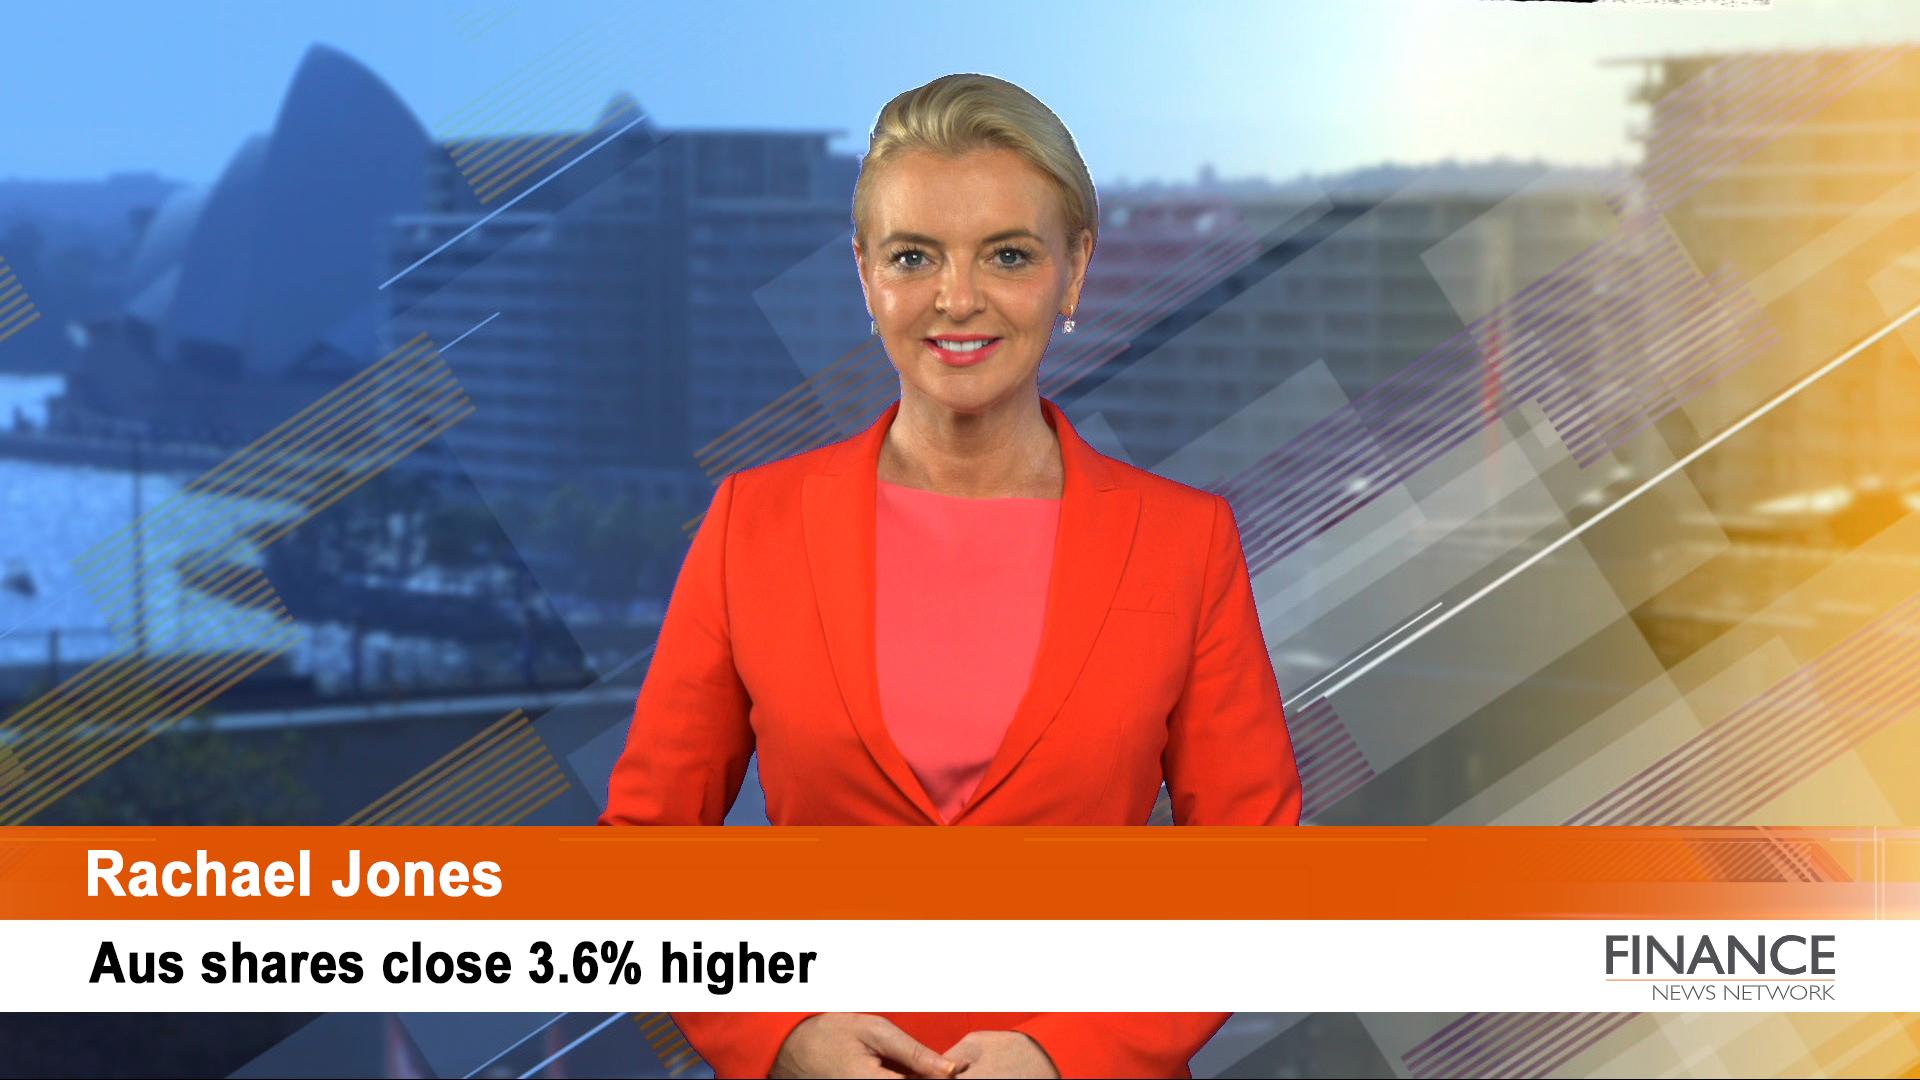 Market enters April on a high: ASX closes 3.6% higher